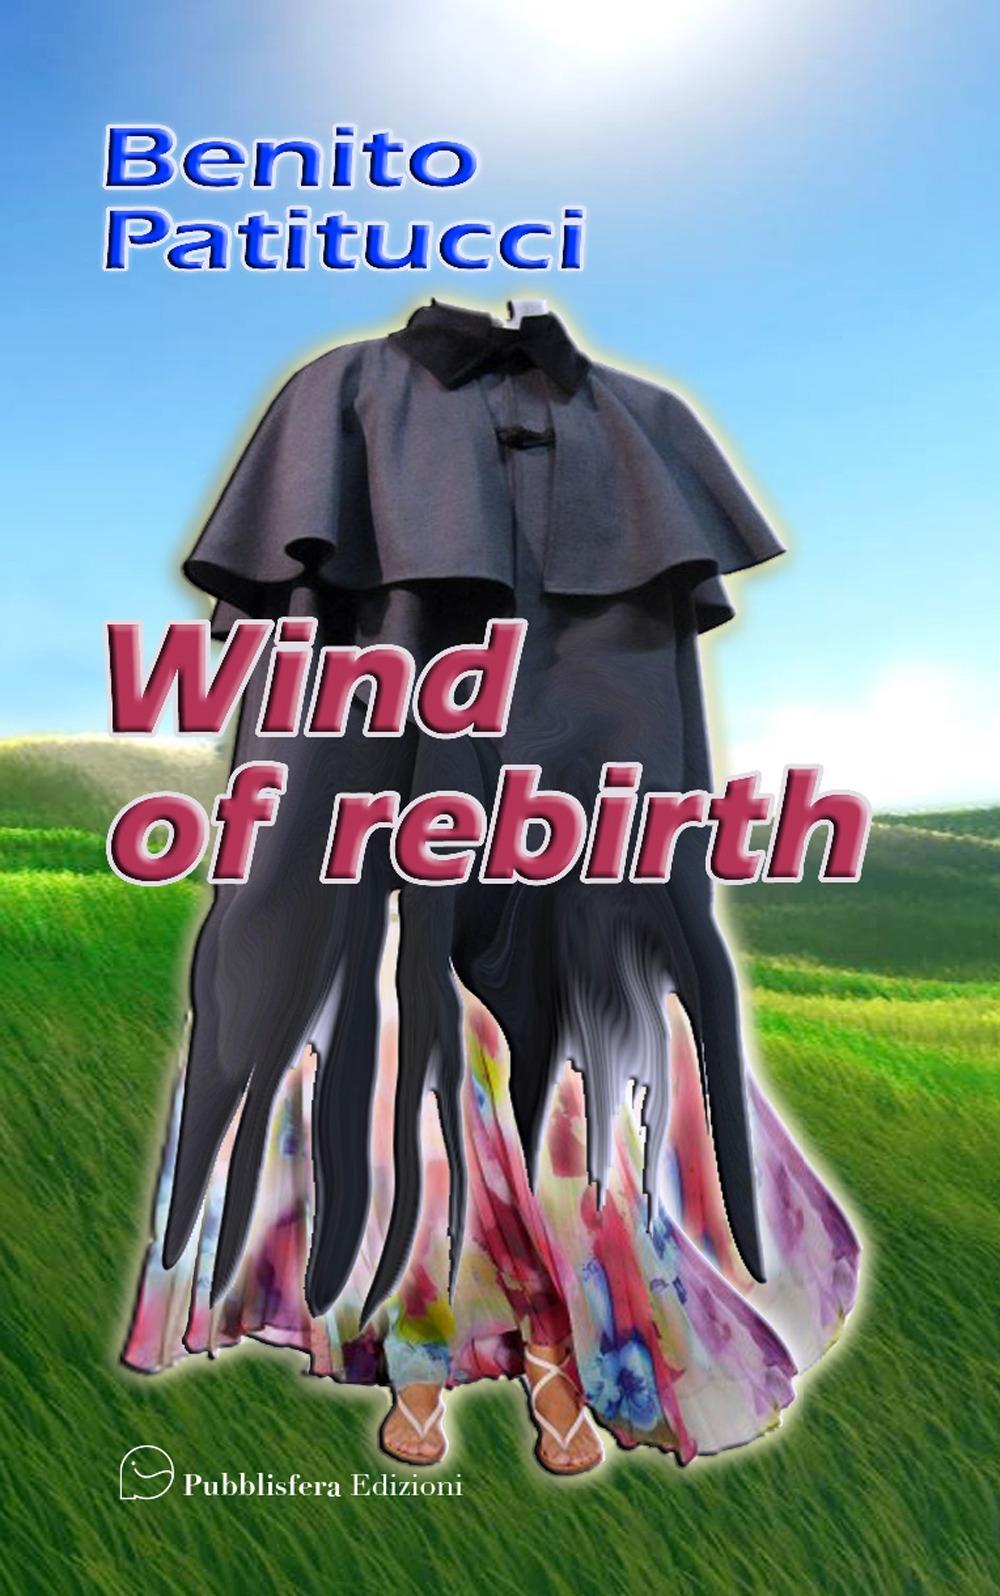 Wind of rebirth